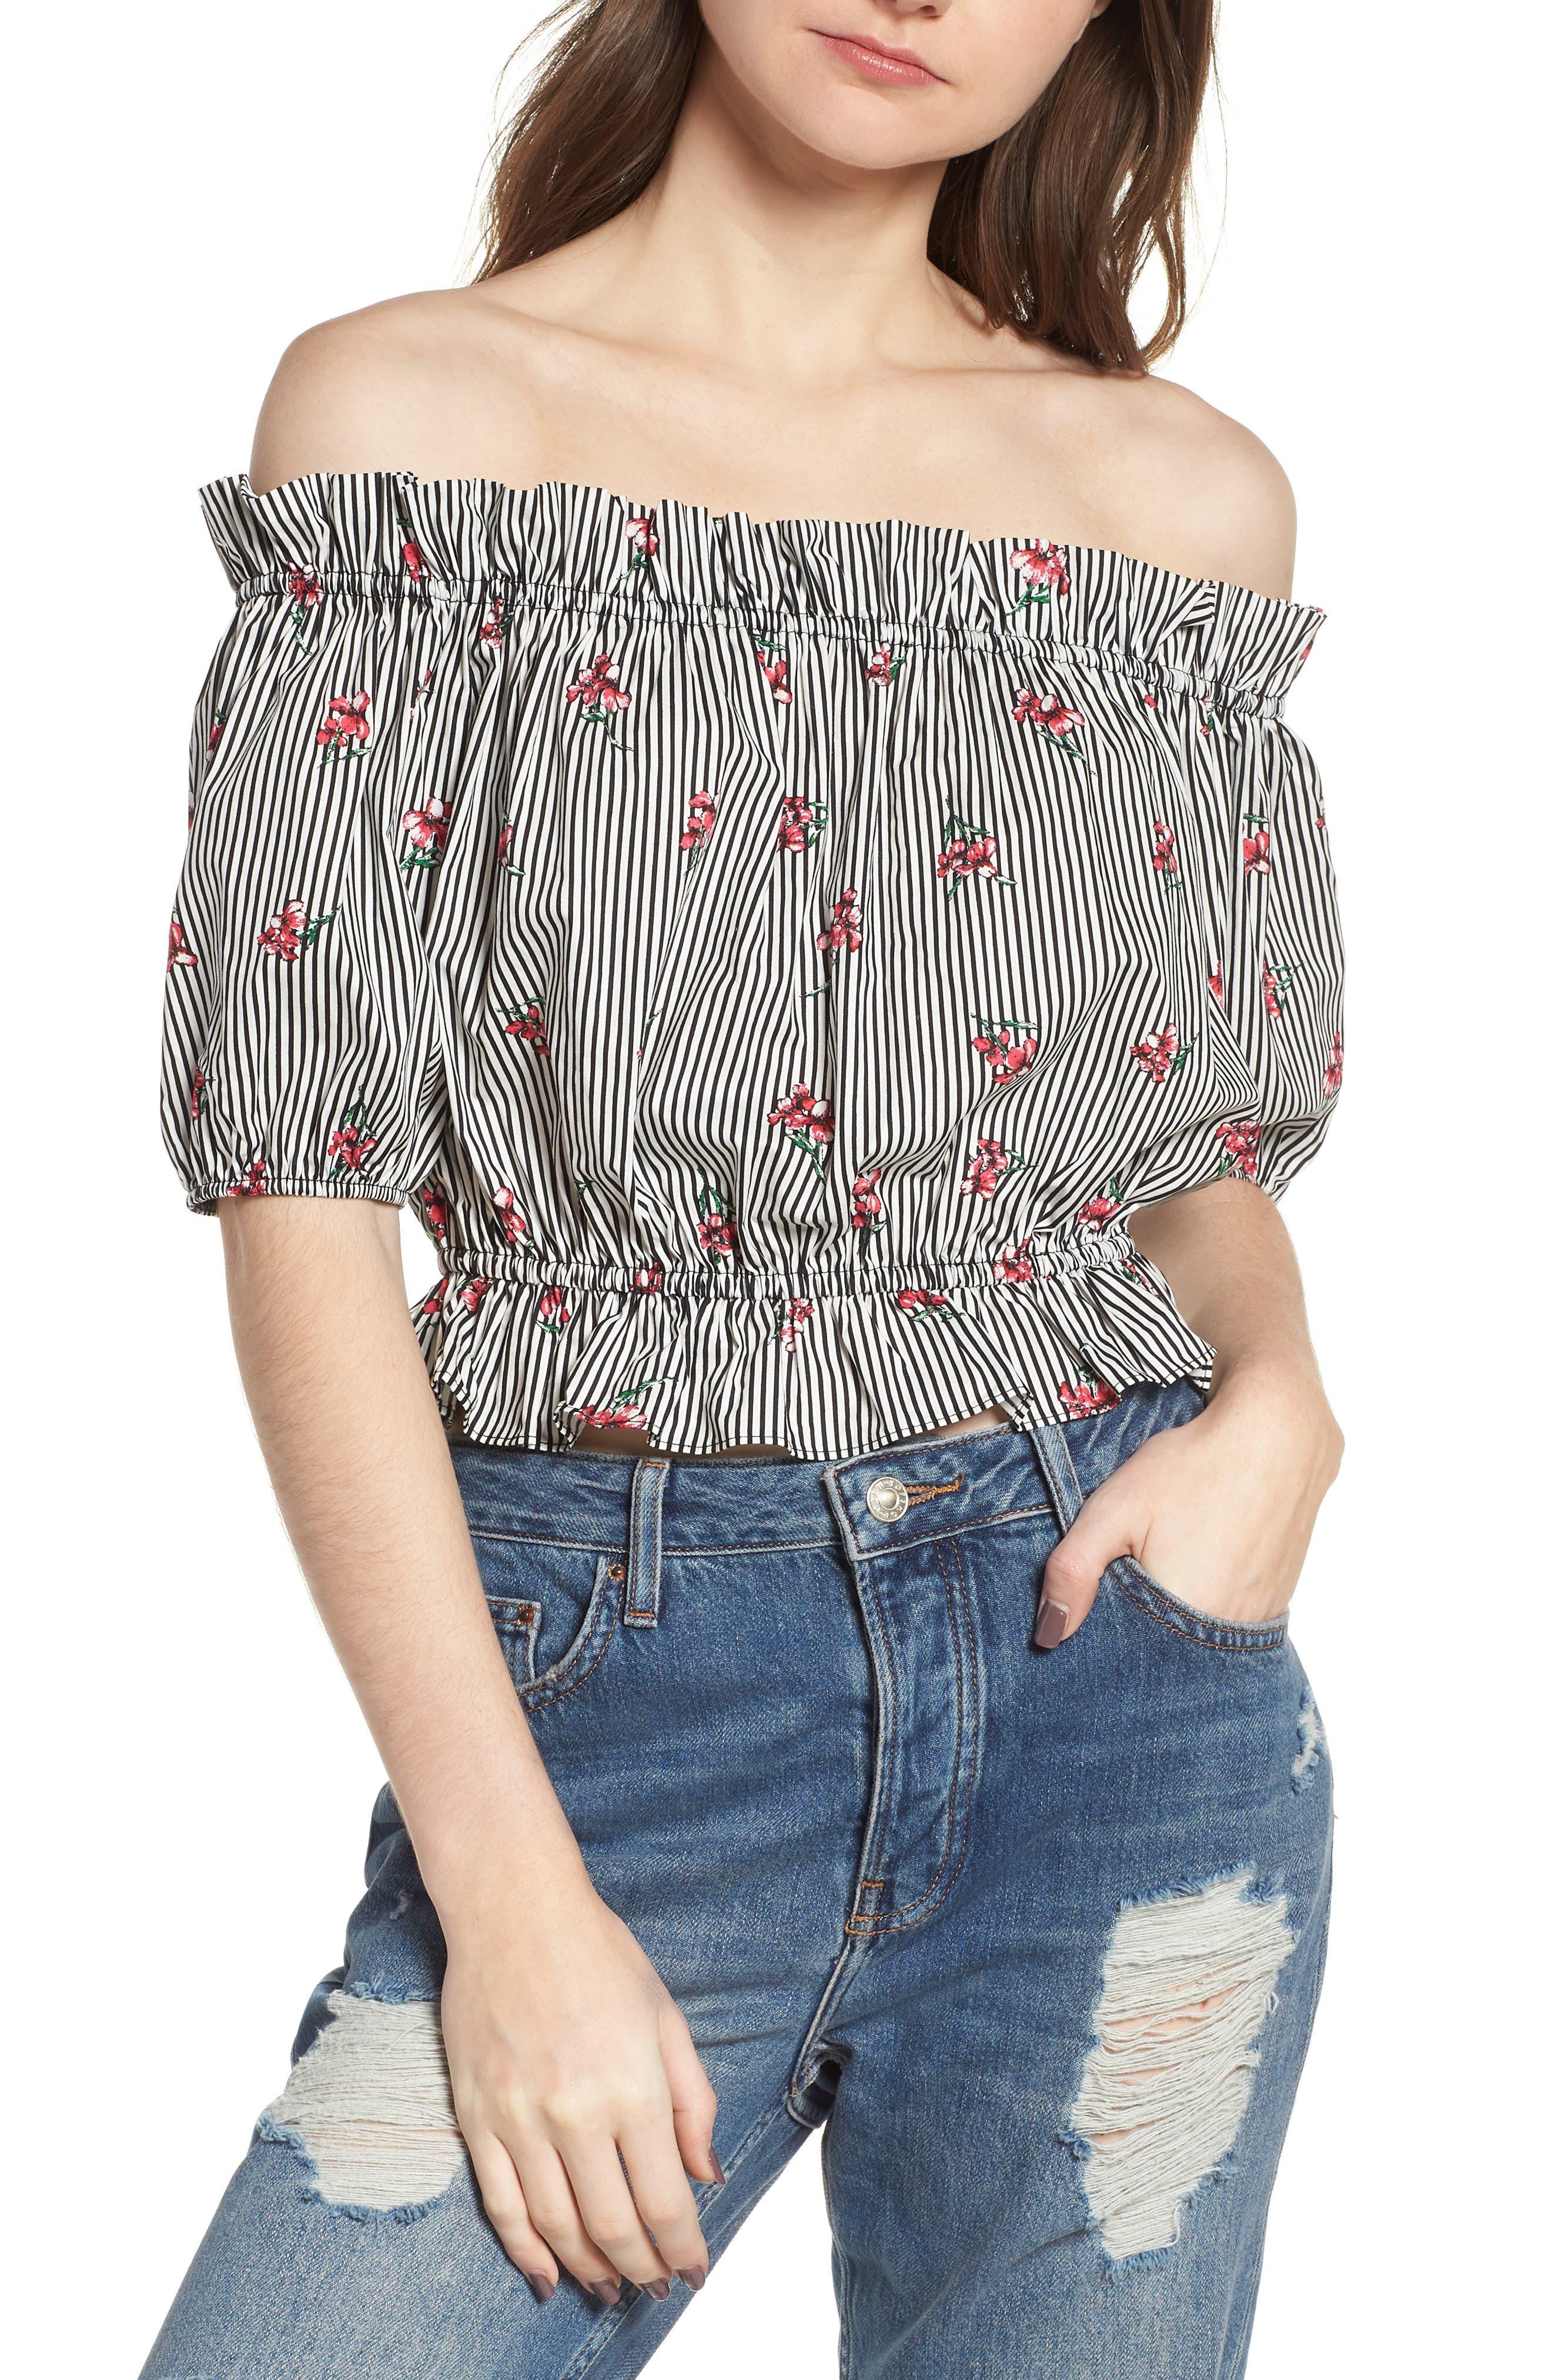 Soprano Floral Stripe Off the Shoulder Crop Top